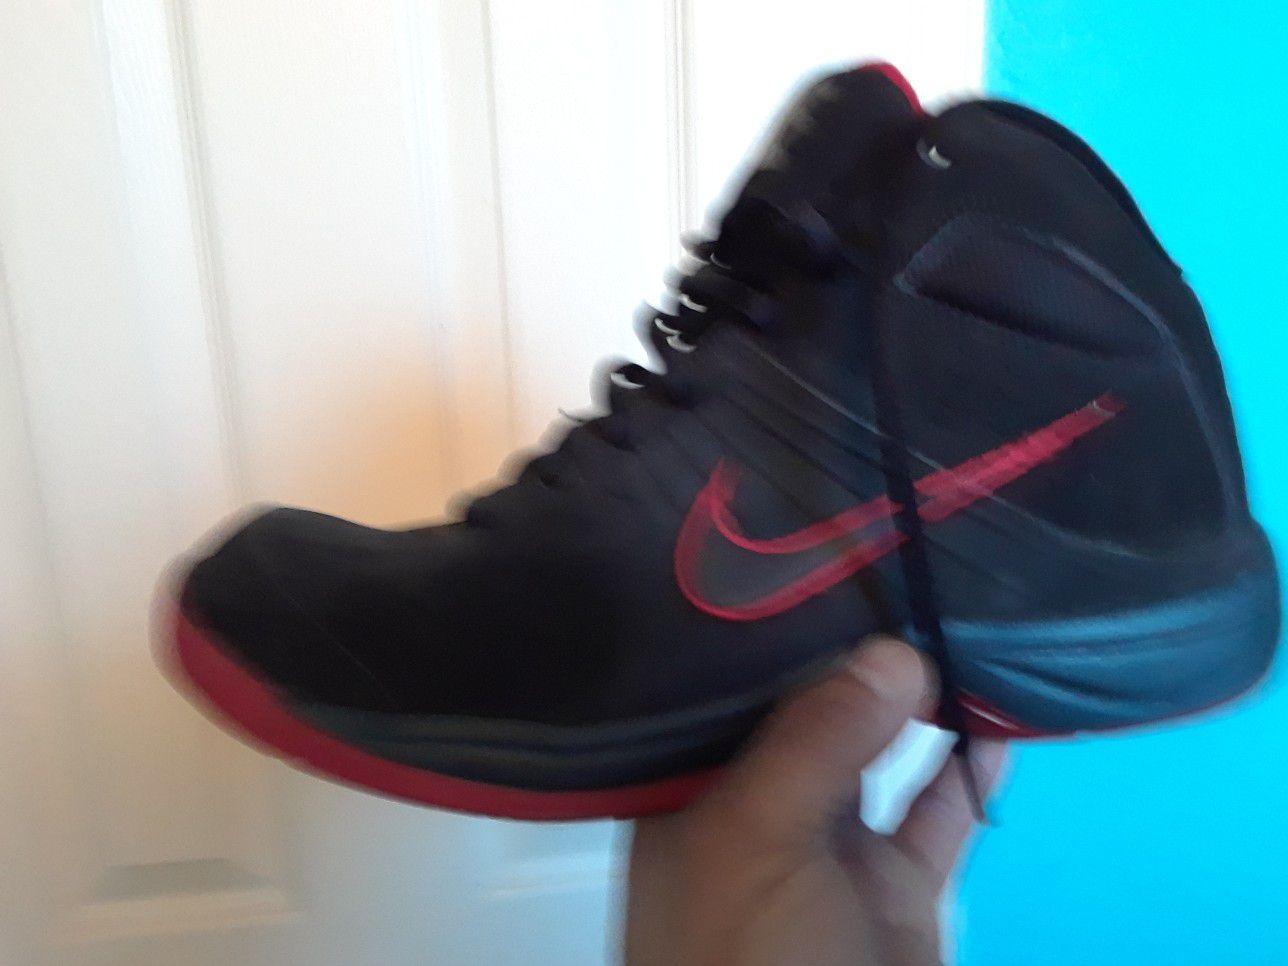 Nike size 10 like new